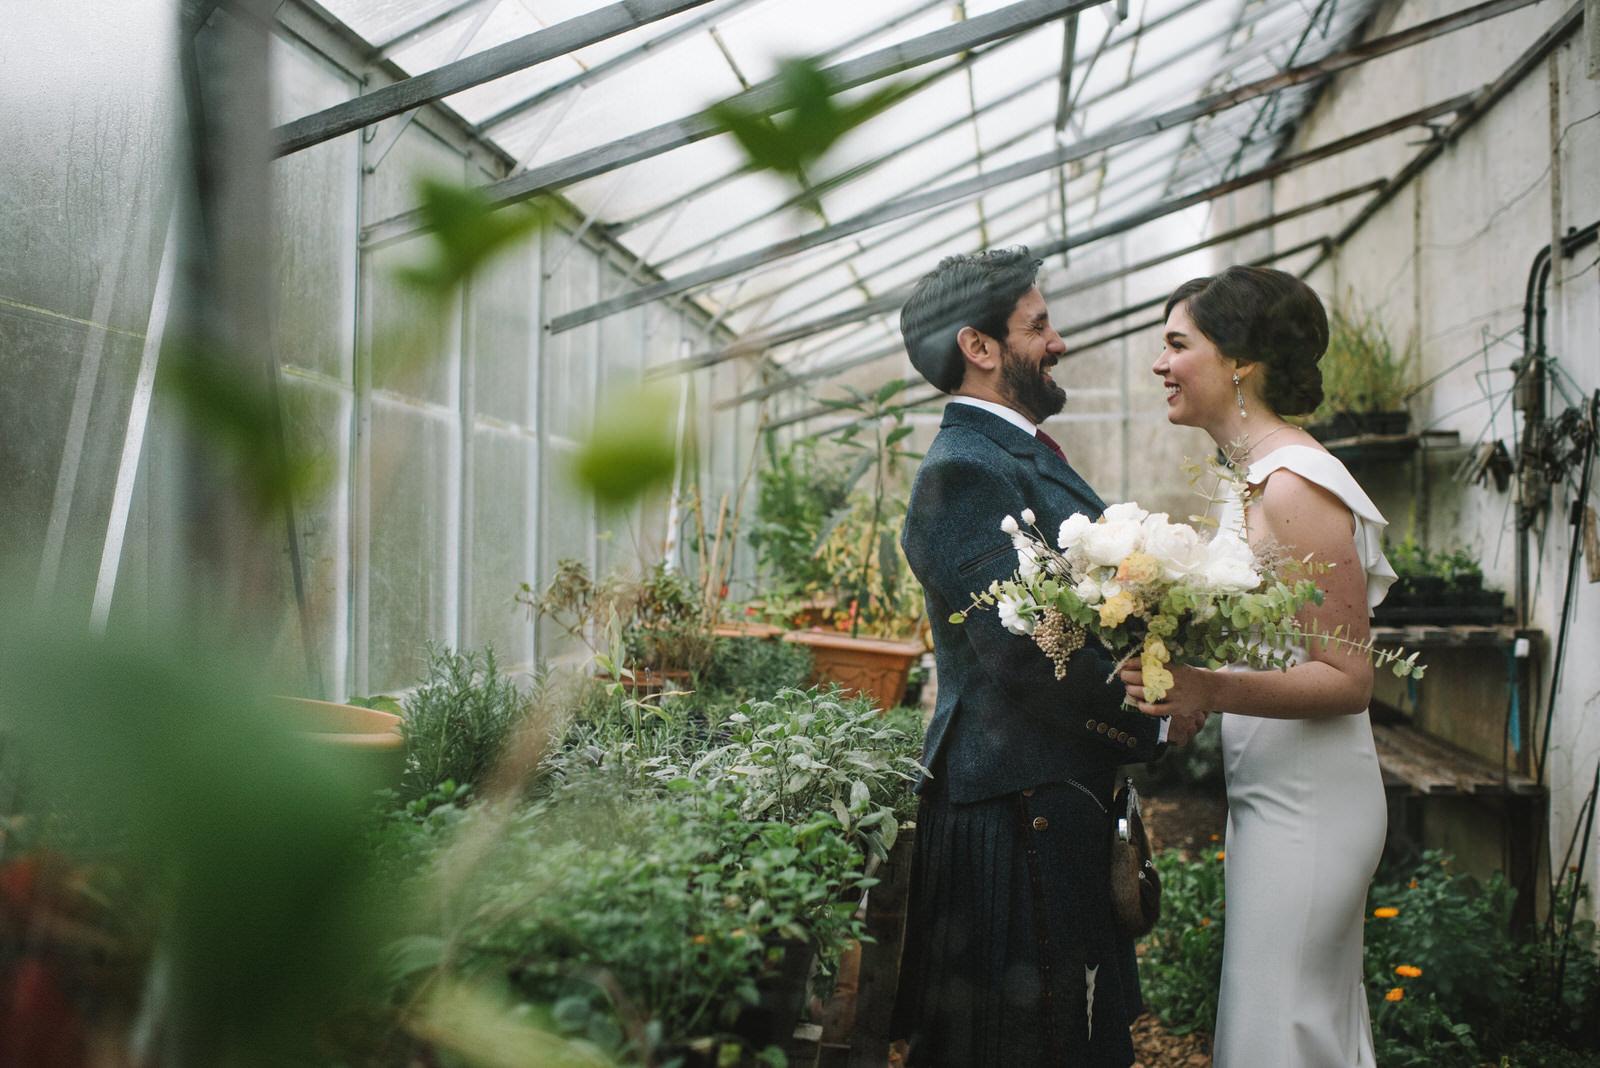 025-COLSTOUN-HOUSE-WEDDING-ALTERNATIVE-WEDDING-PHOTOGRAPHER-GLASGOW-WEDDING-PHOTOGRAPHER-STYLISH-SCOTTISH-WEDDING.JPG